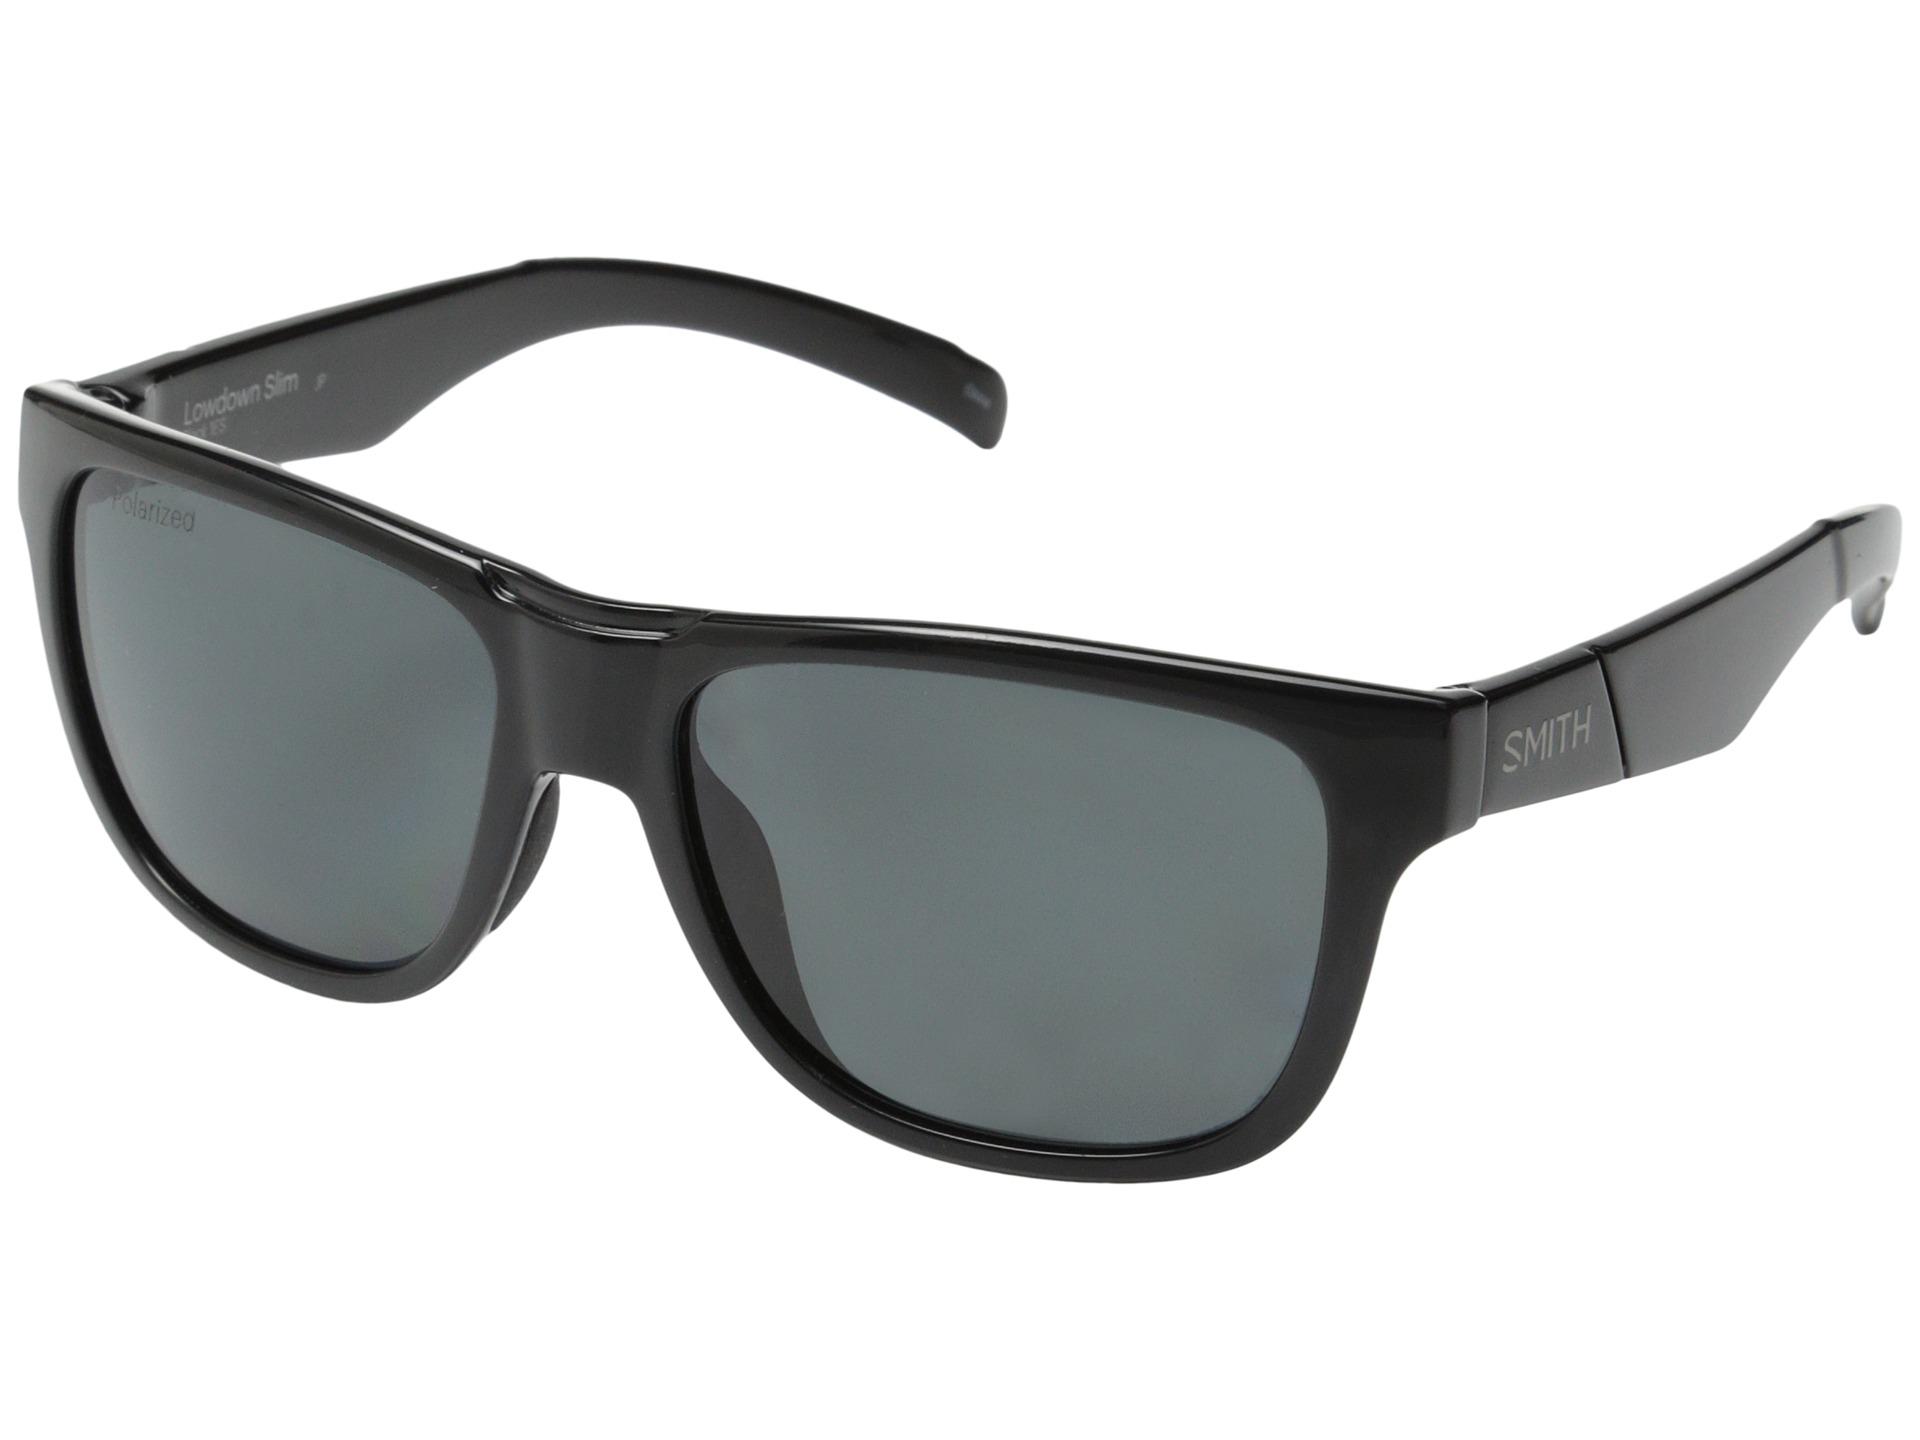 e562333204 Smith Optics Lowdown Slim Black Polar Gray Carbonic TLT Lenses on ...